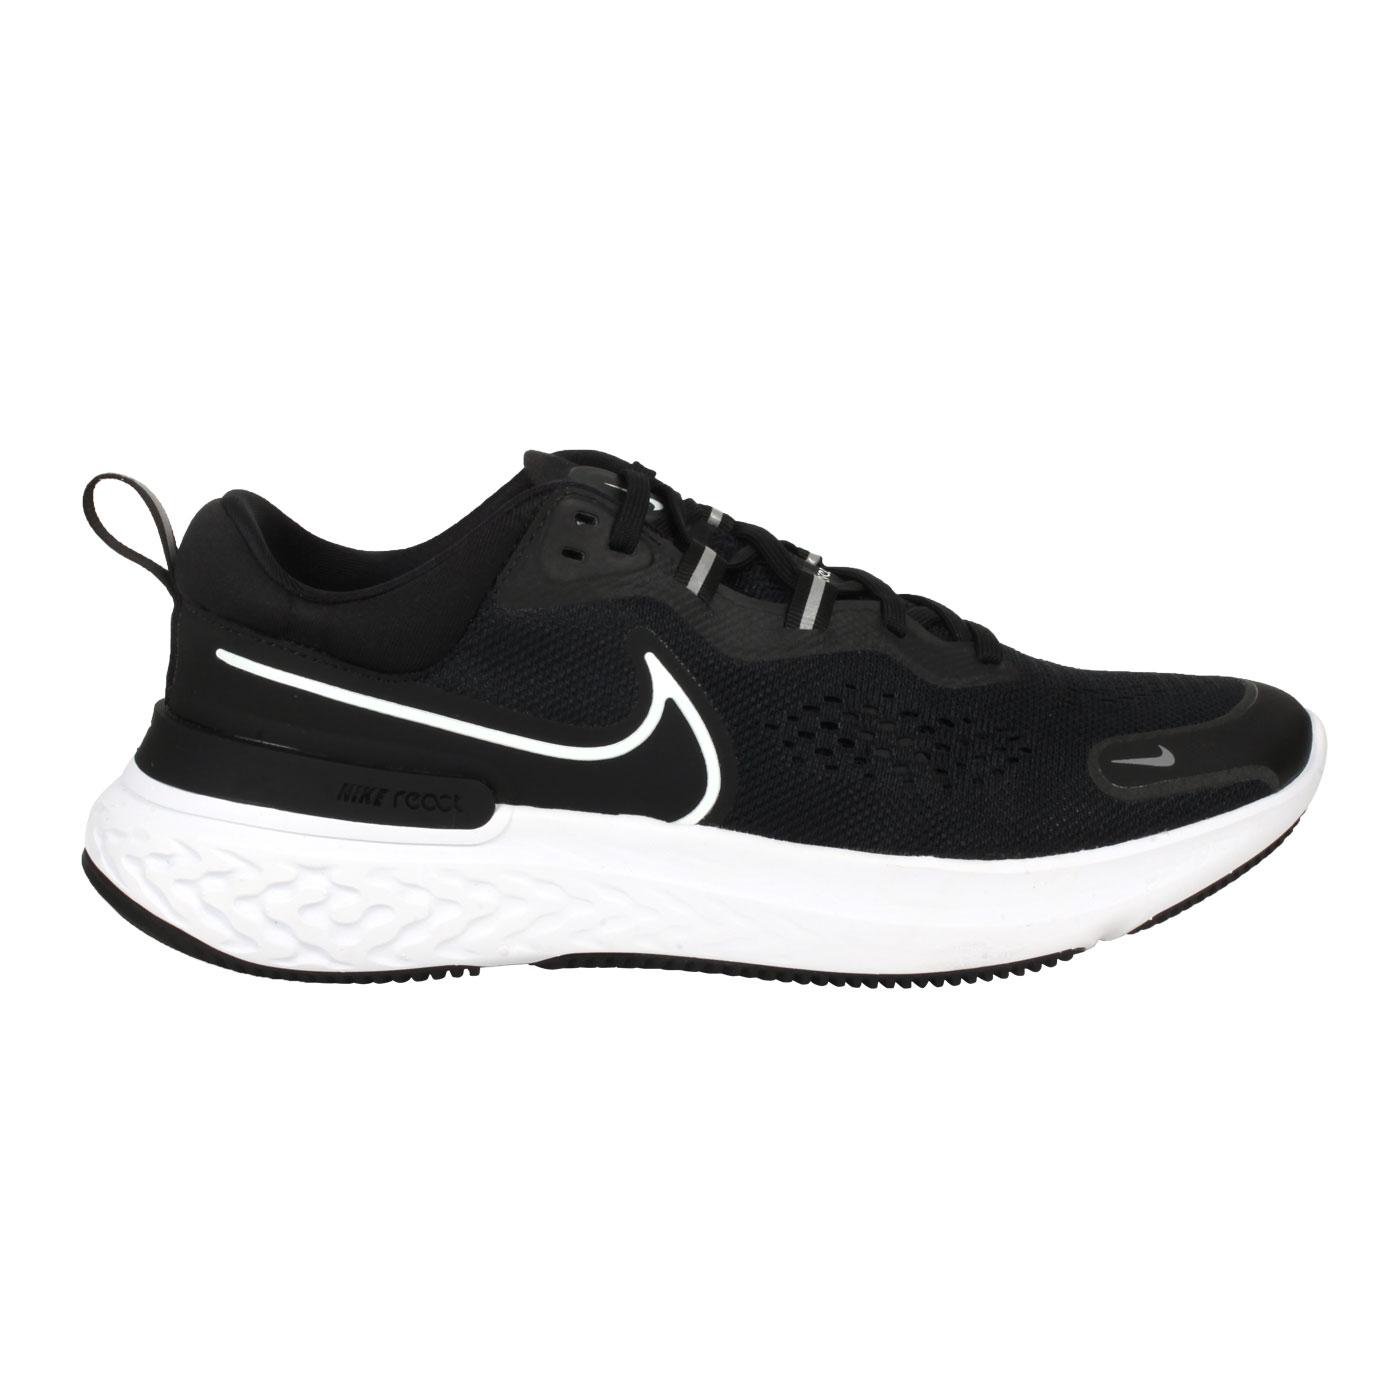 NIKE 男款休閒運動鞋  @REACT MILER 2@CW7121001 - 黑白